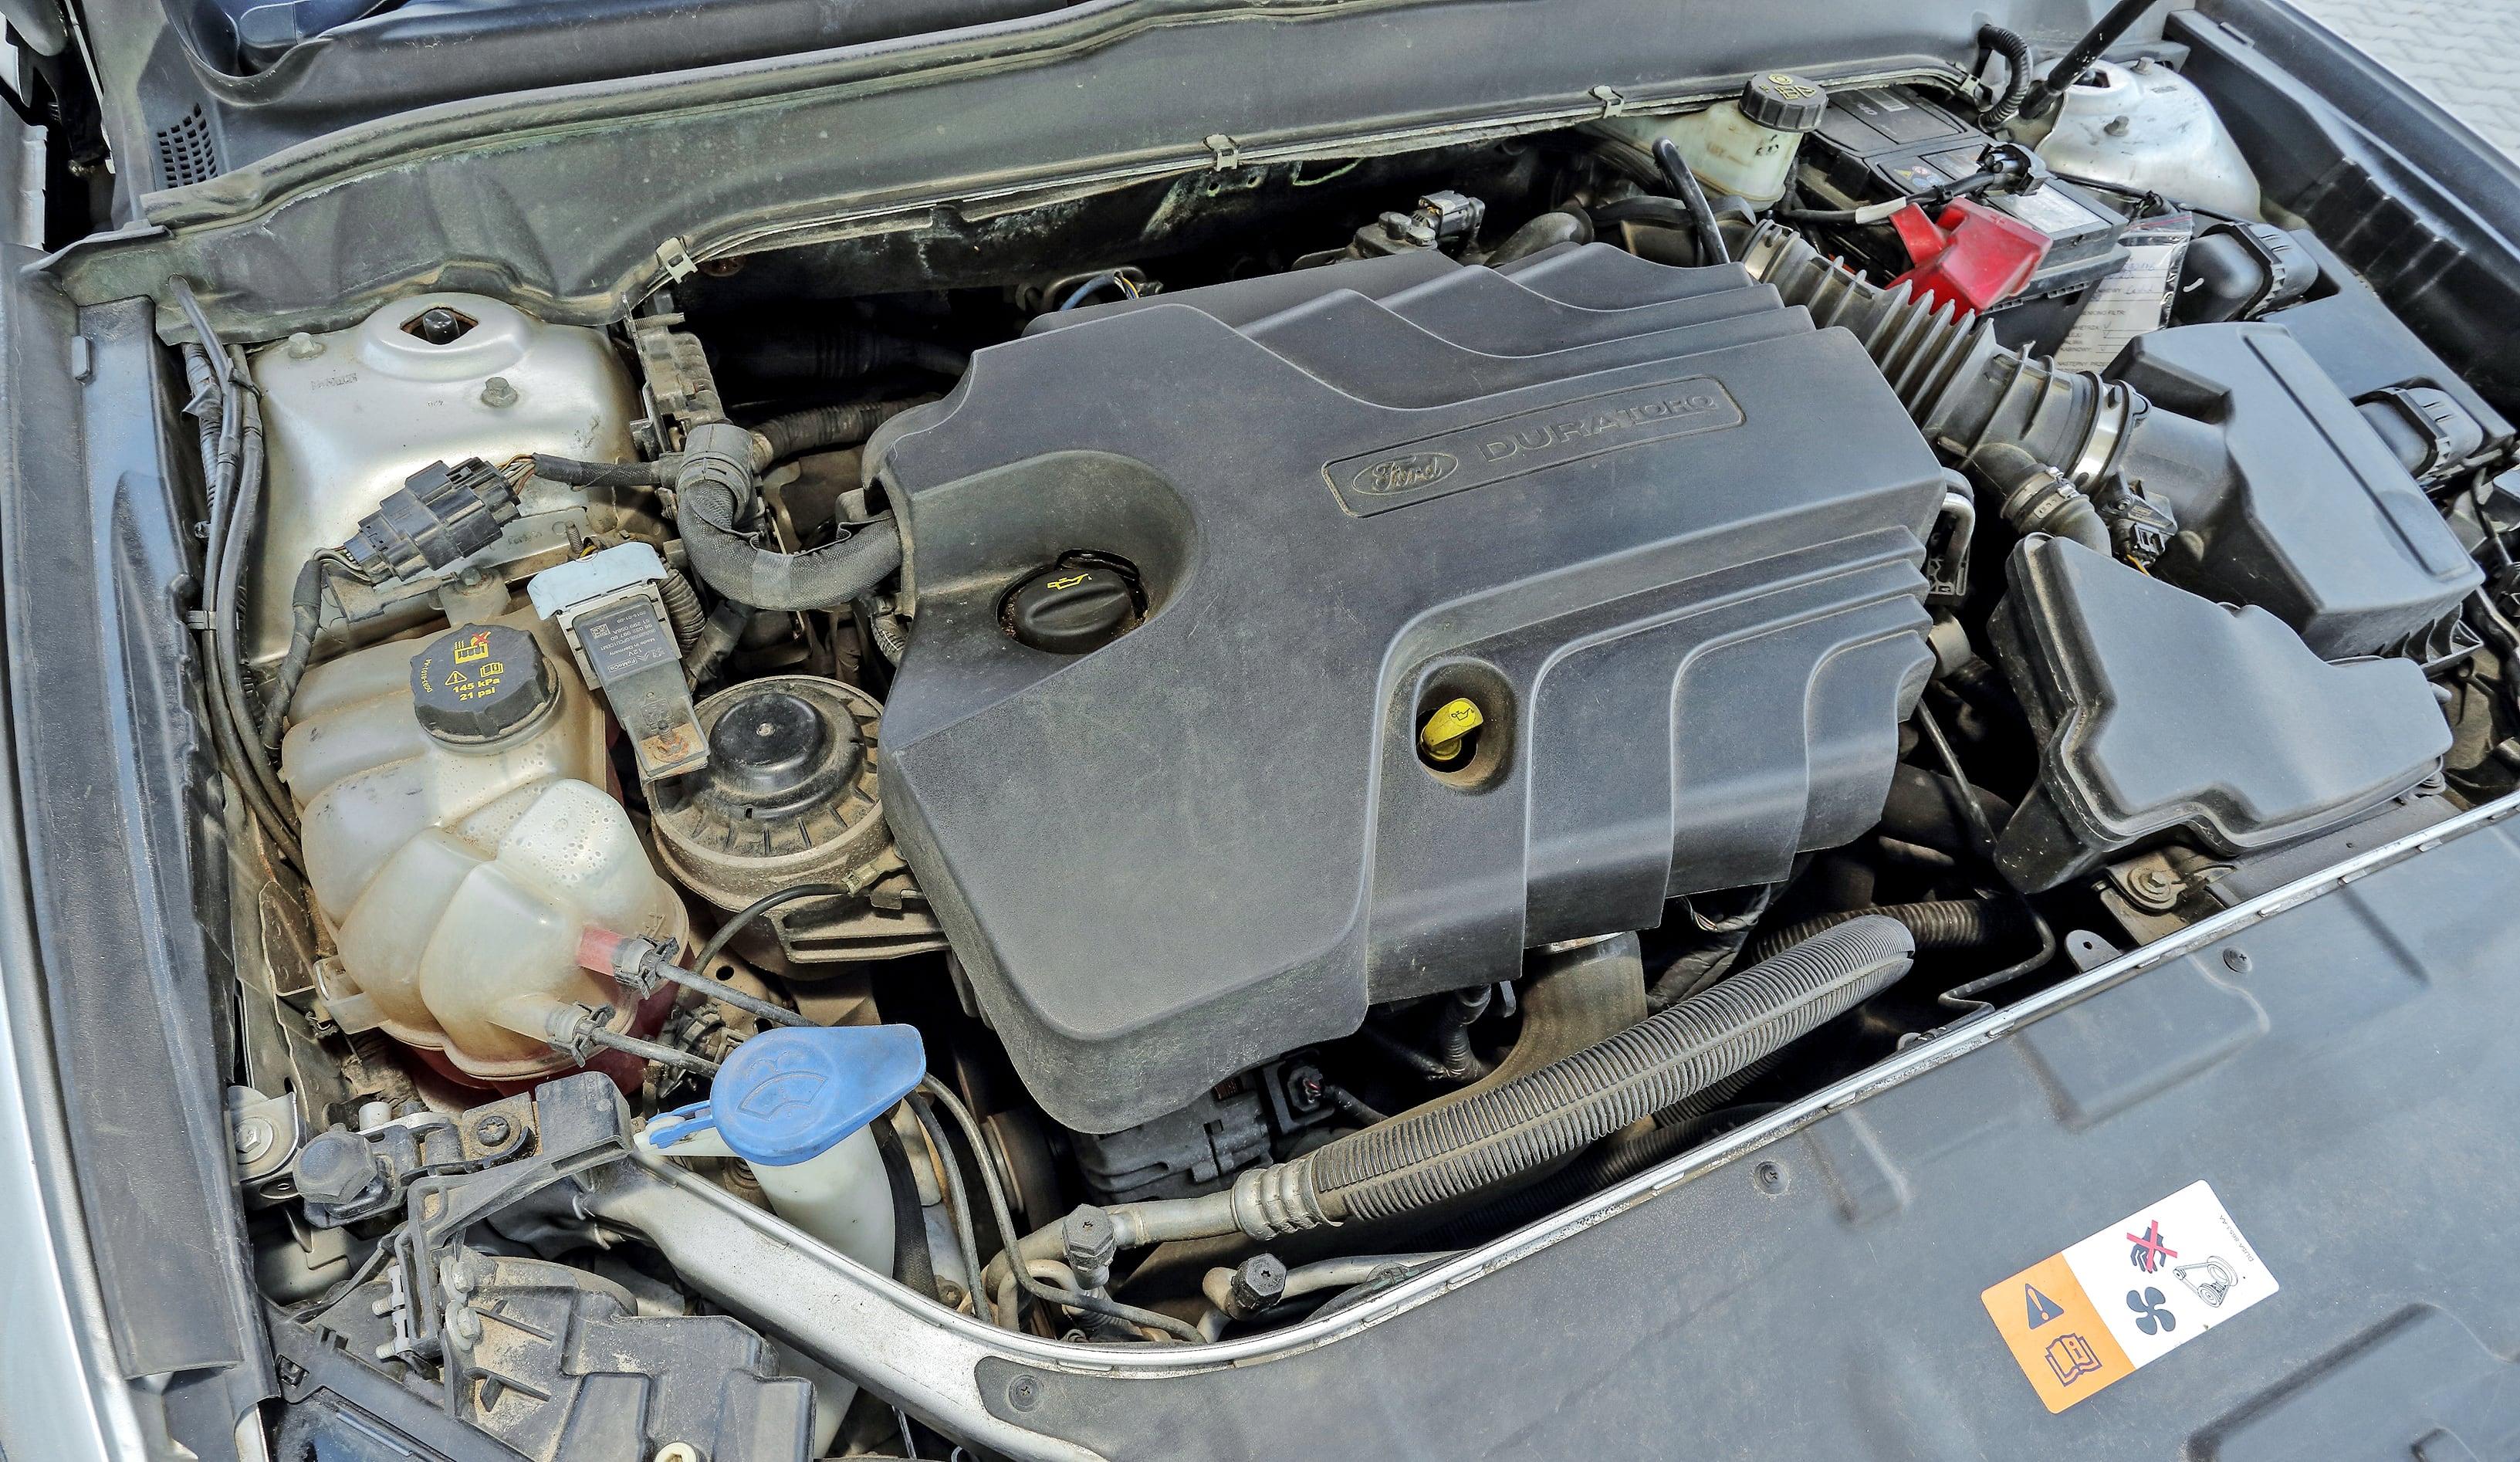 Ford Mondeo Mk5 2.0 TDCi silnik